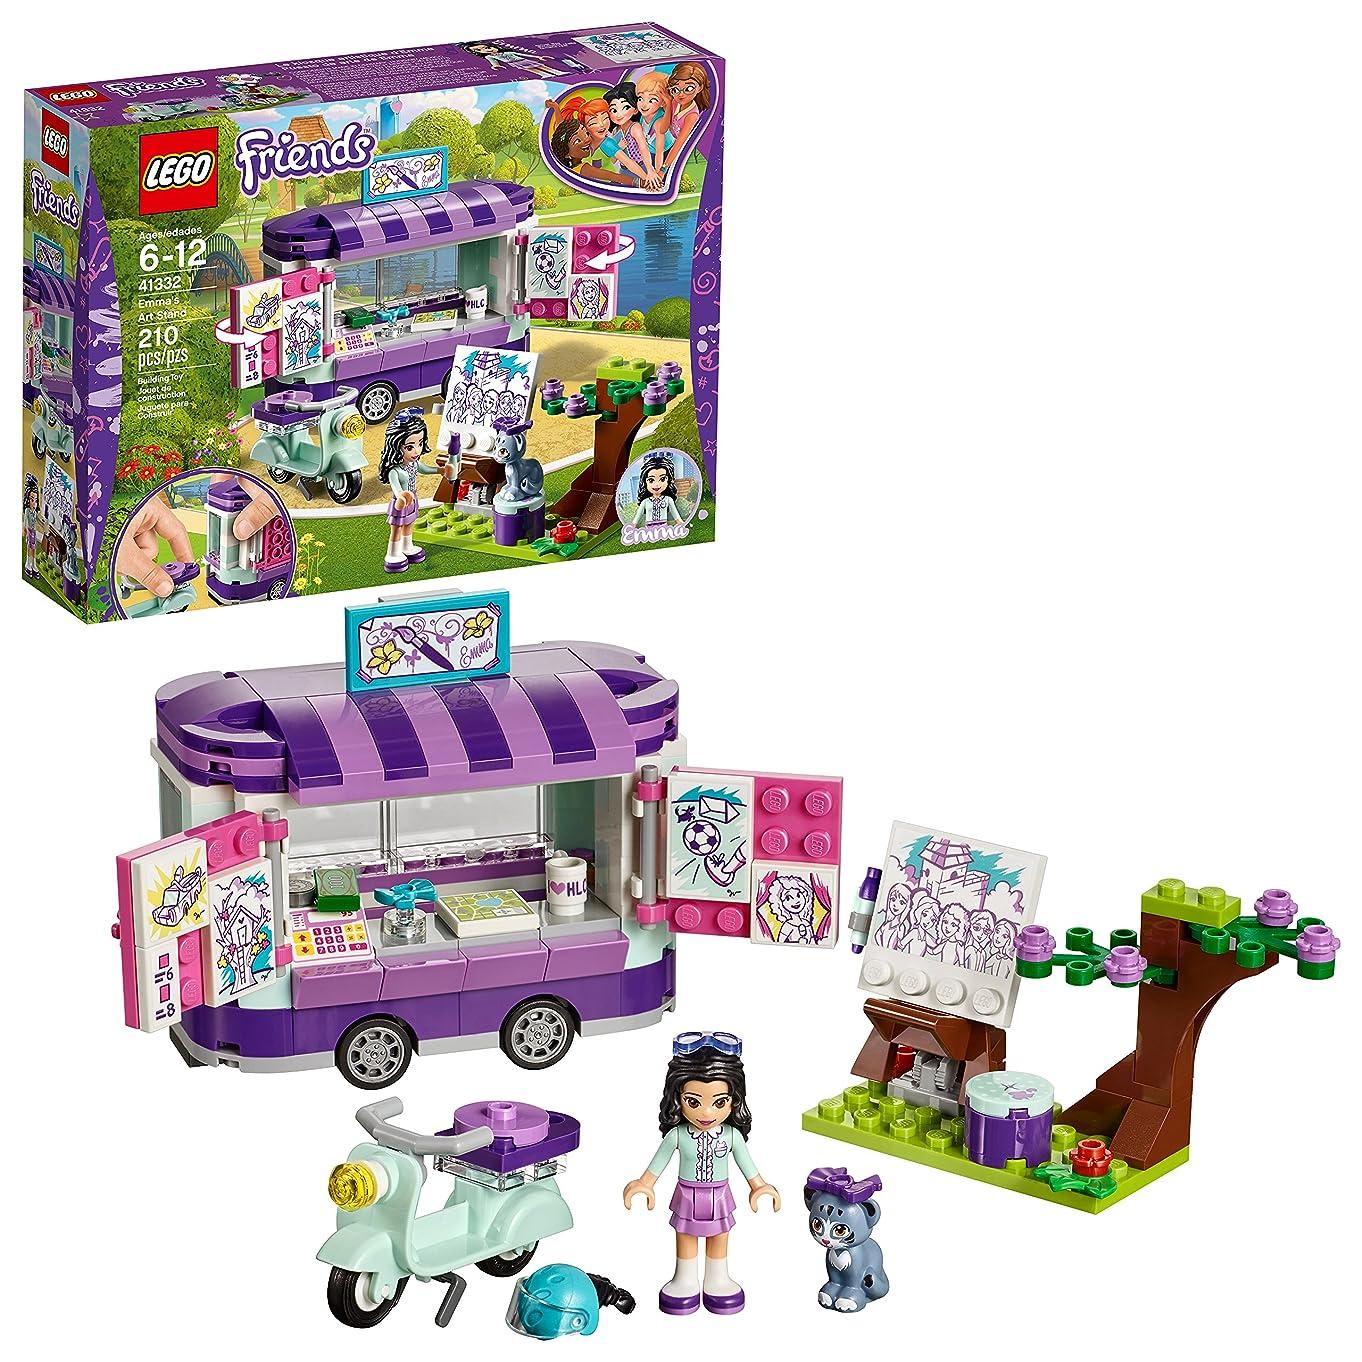 LEGO Friends Emma's Art Stand 41332 Building Set (210 Piece)